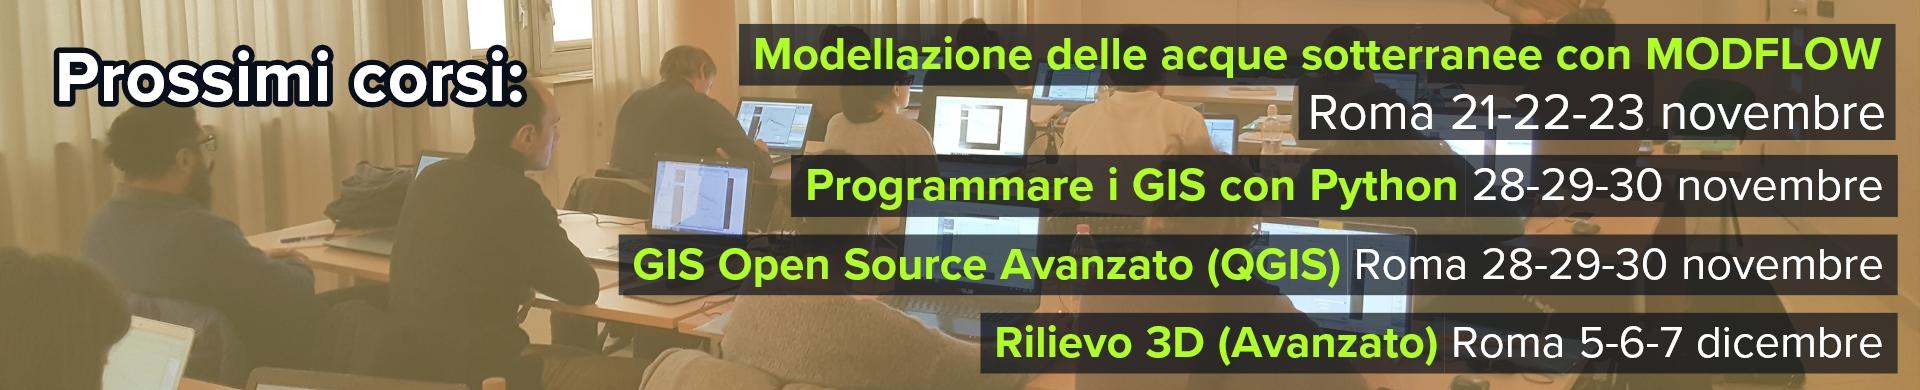 slide_Prox_corsi4